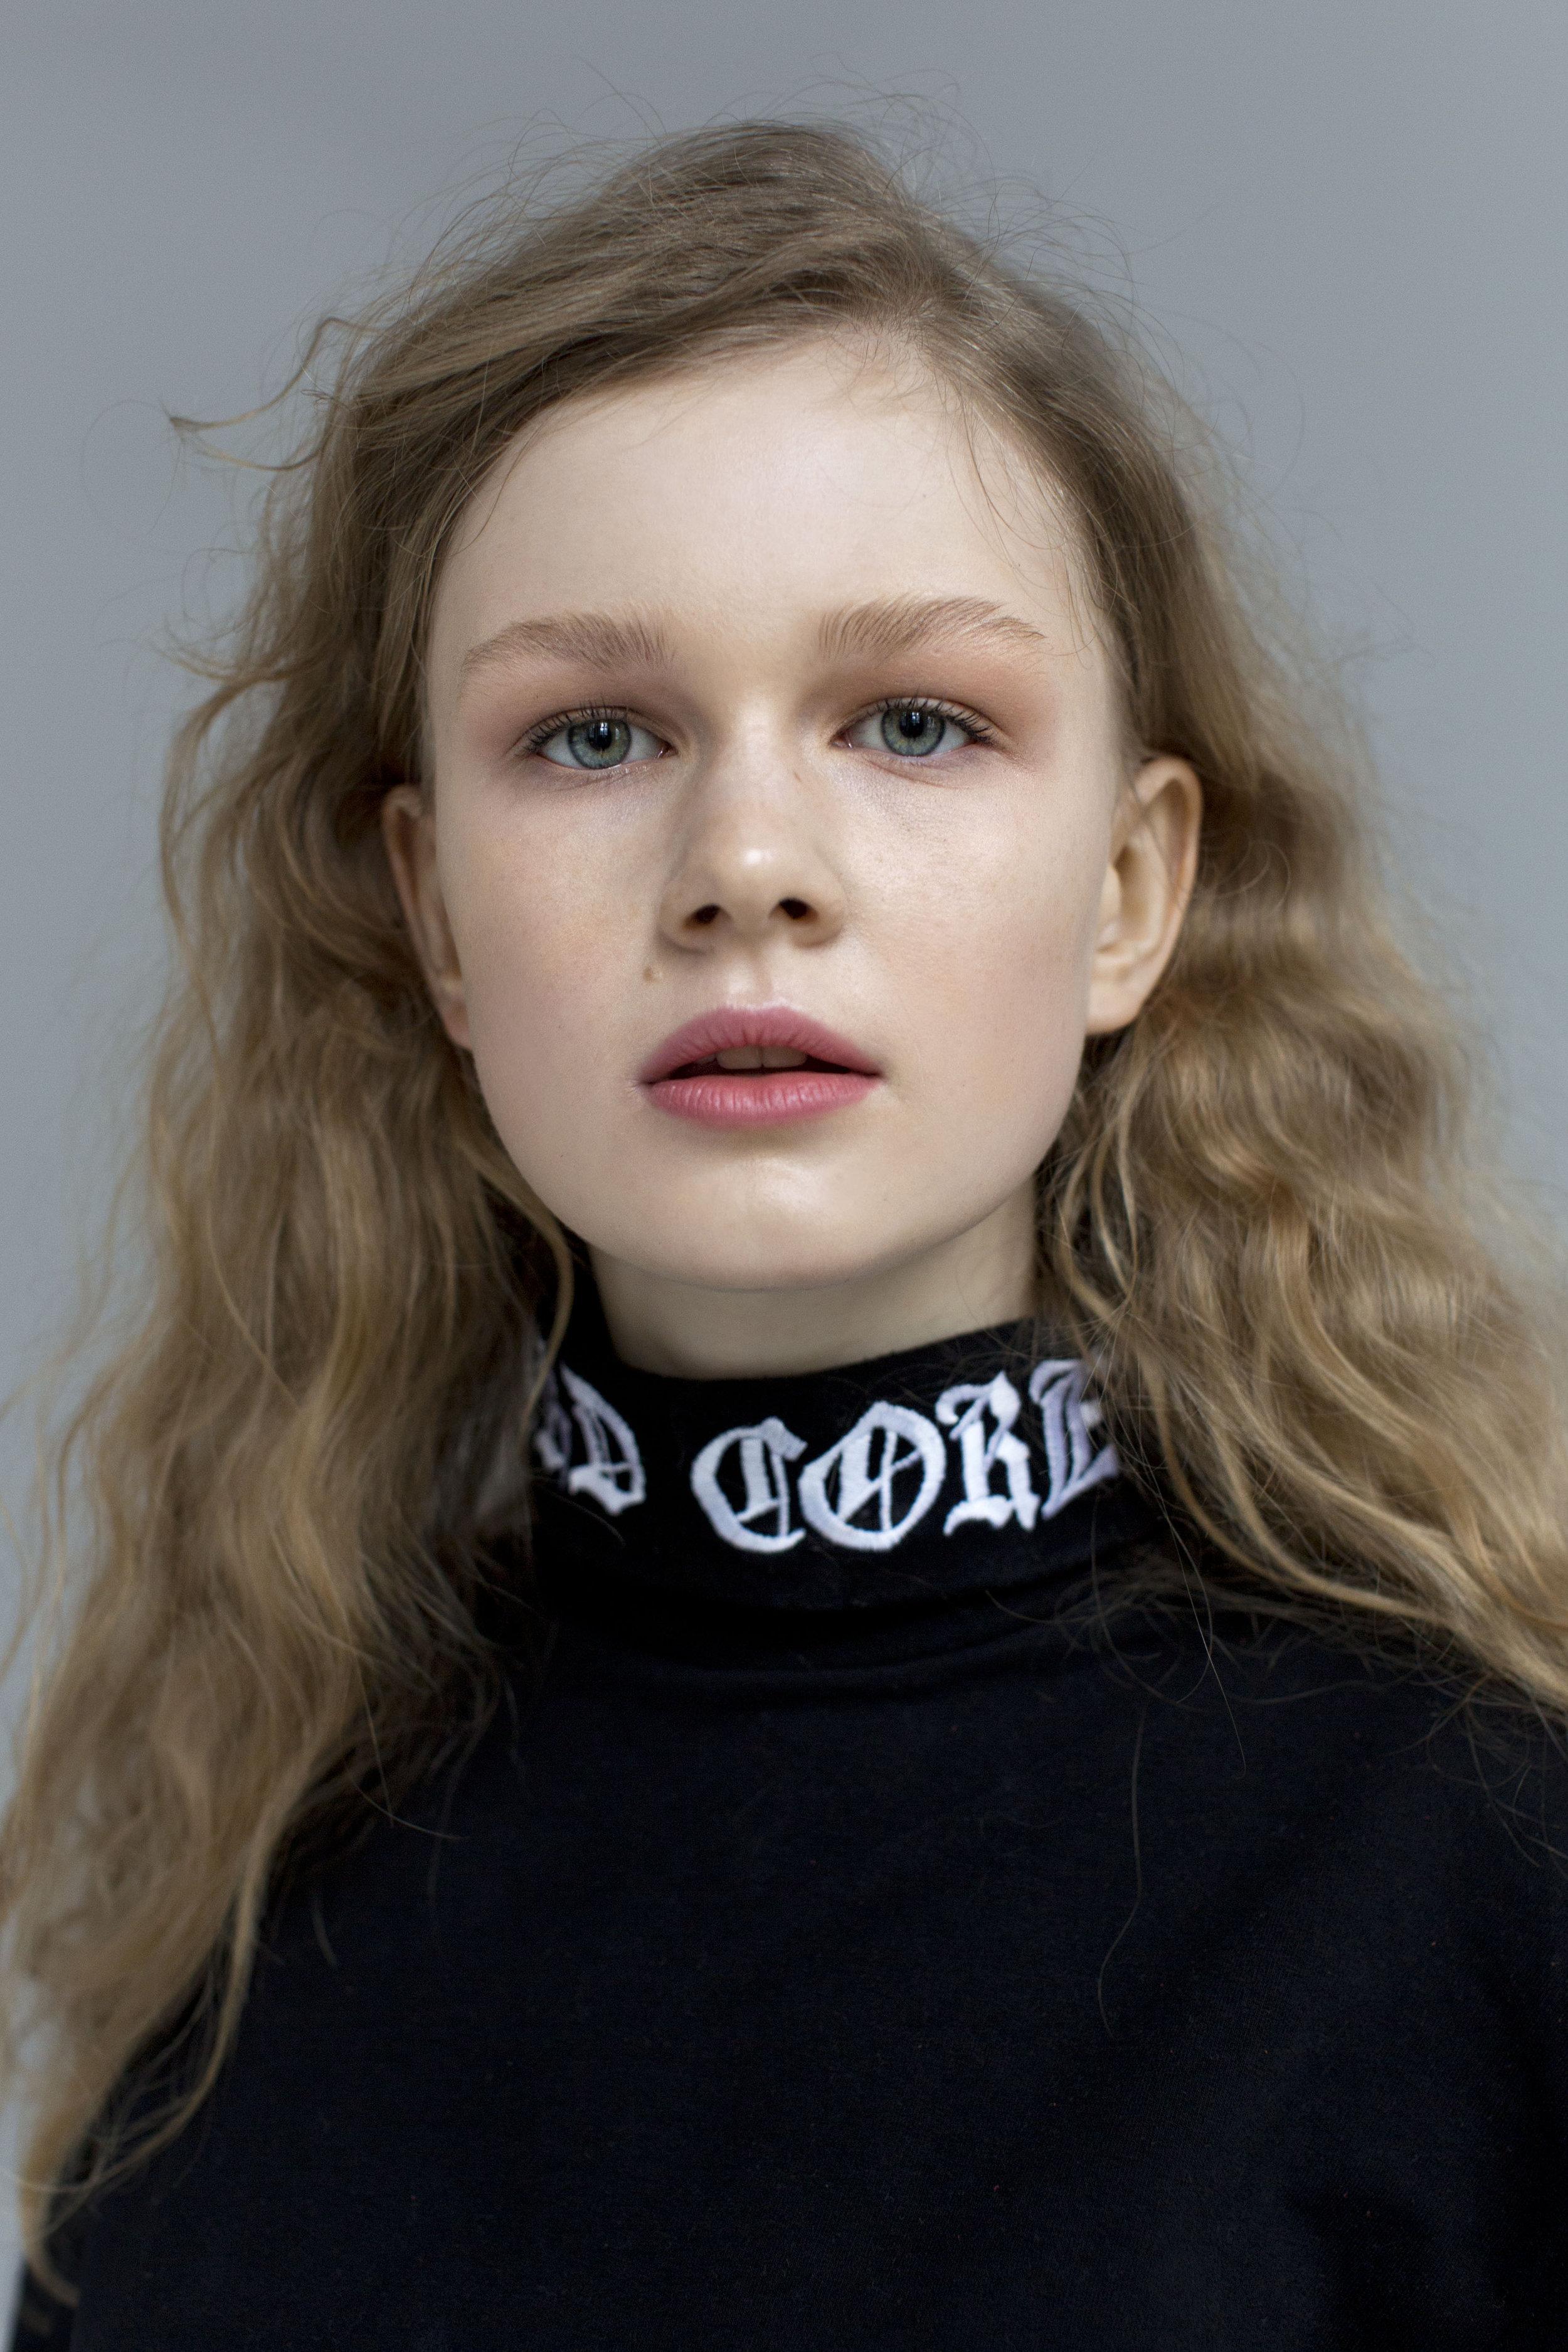 BLUEBERRY  Published On 13 March 2017   Photographer  Magdalena Czajka  Stylist  Karol Młodziński  Make-up&Hair  Katarzyna Biały  Model  Jagoda Jurek @Uncover Models